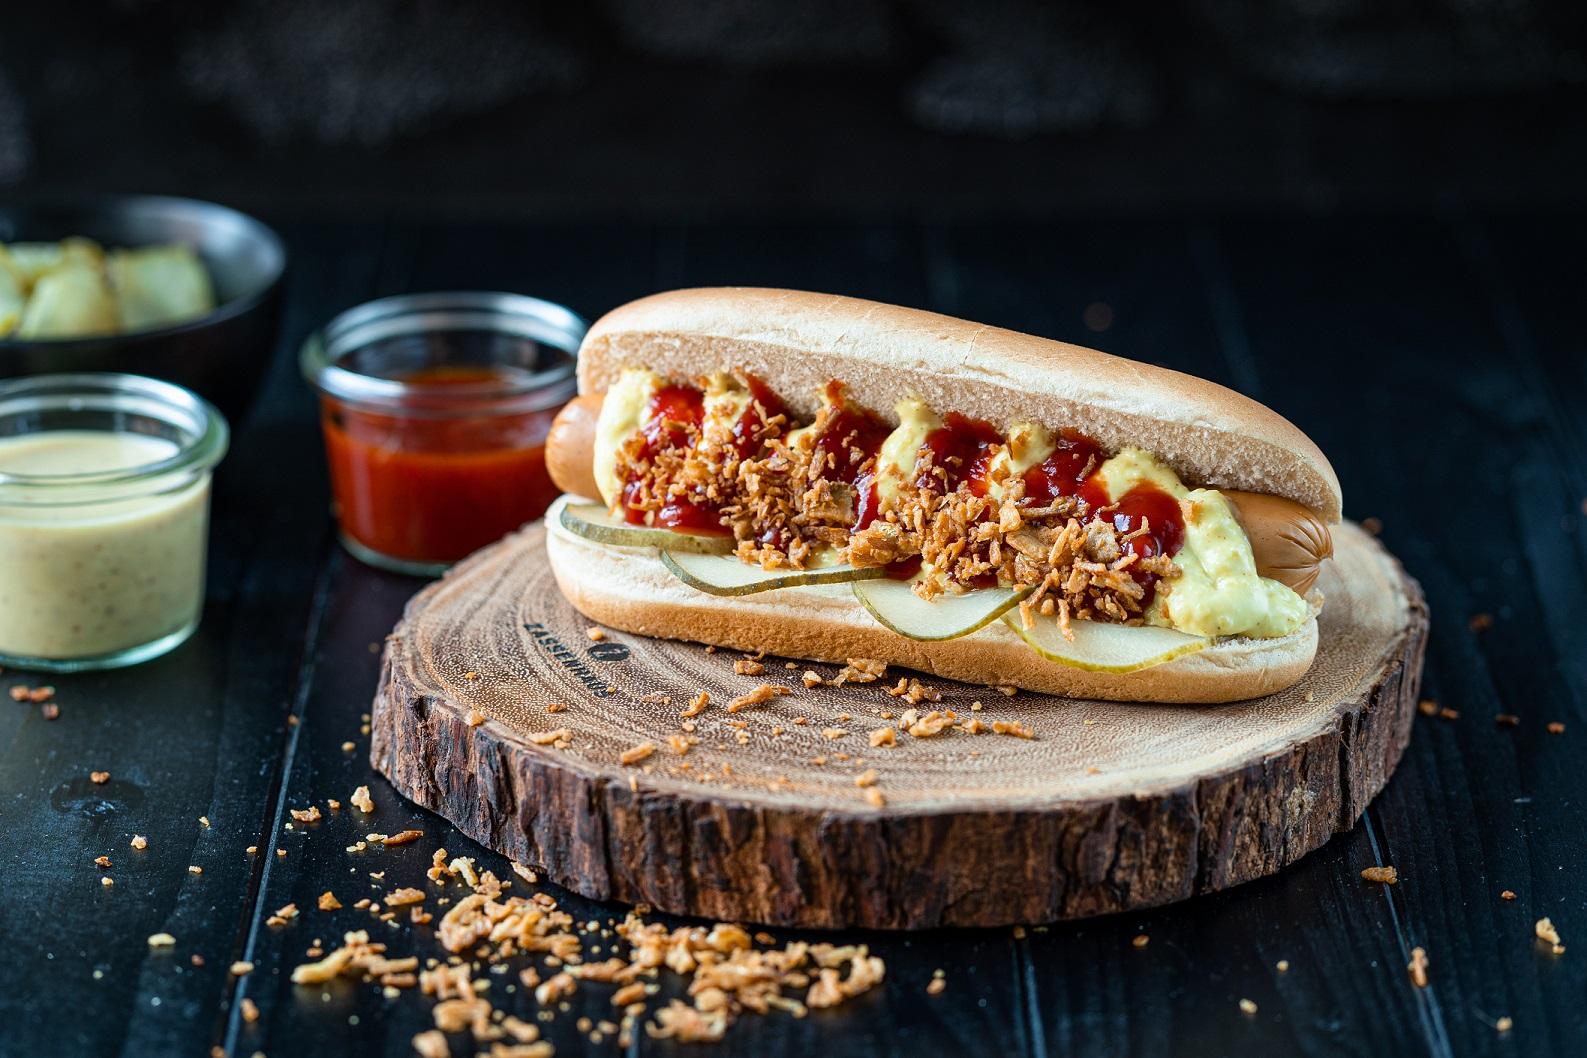 Damhus Puten Hot Dog, 25x60g, zarte Eigenhaut